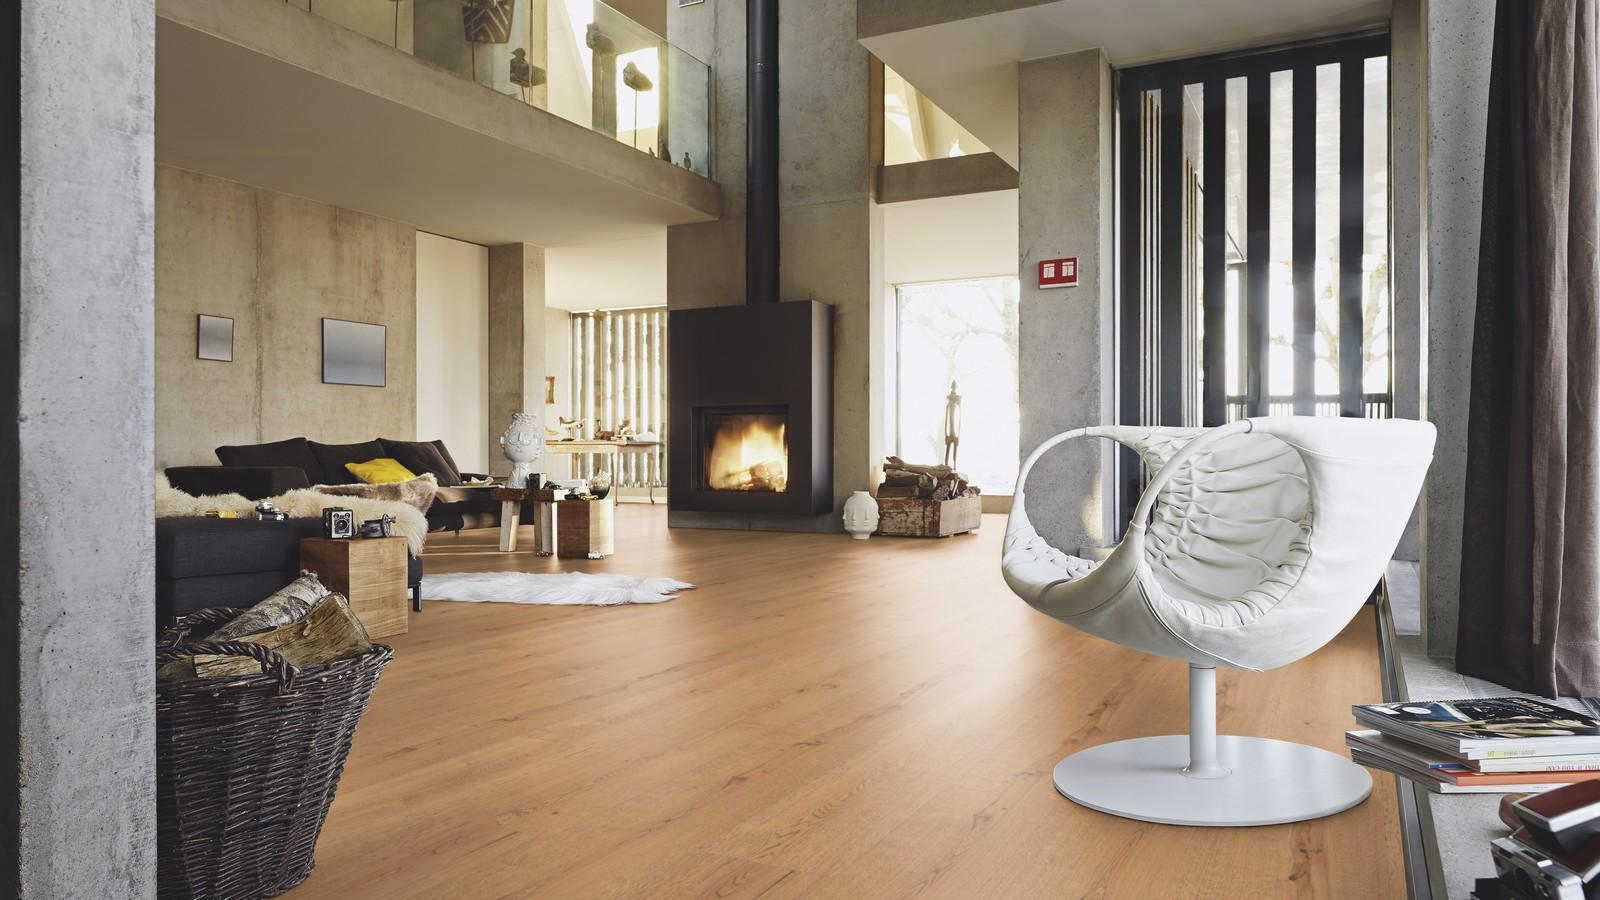 suelos de madera-vivo-parquet-lindura-arquidecora